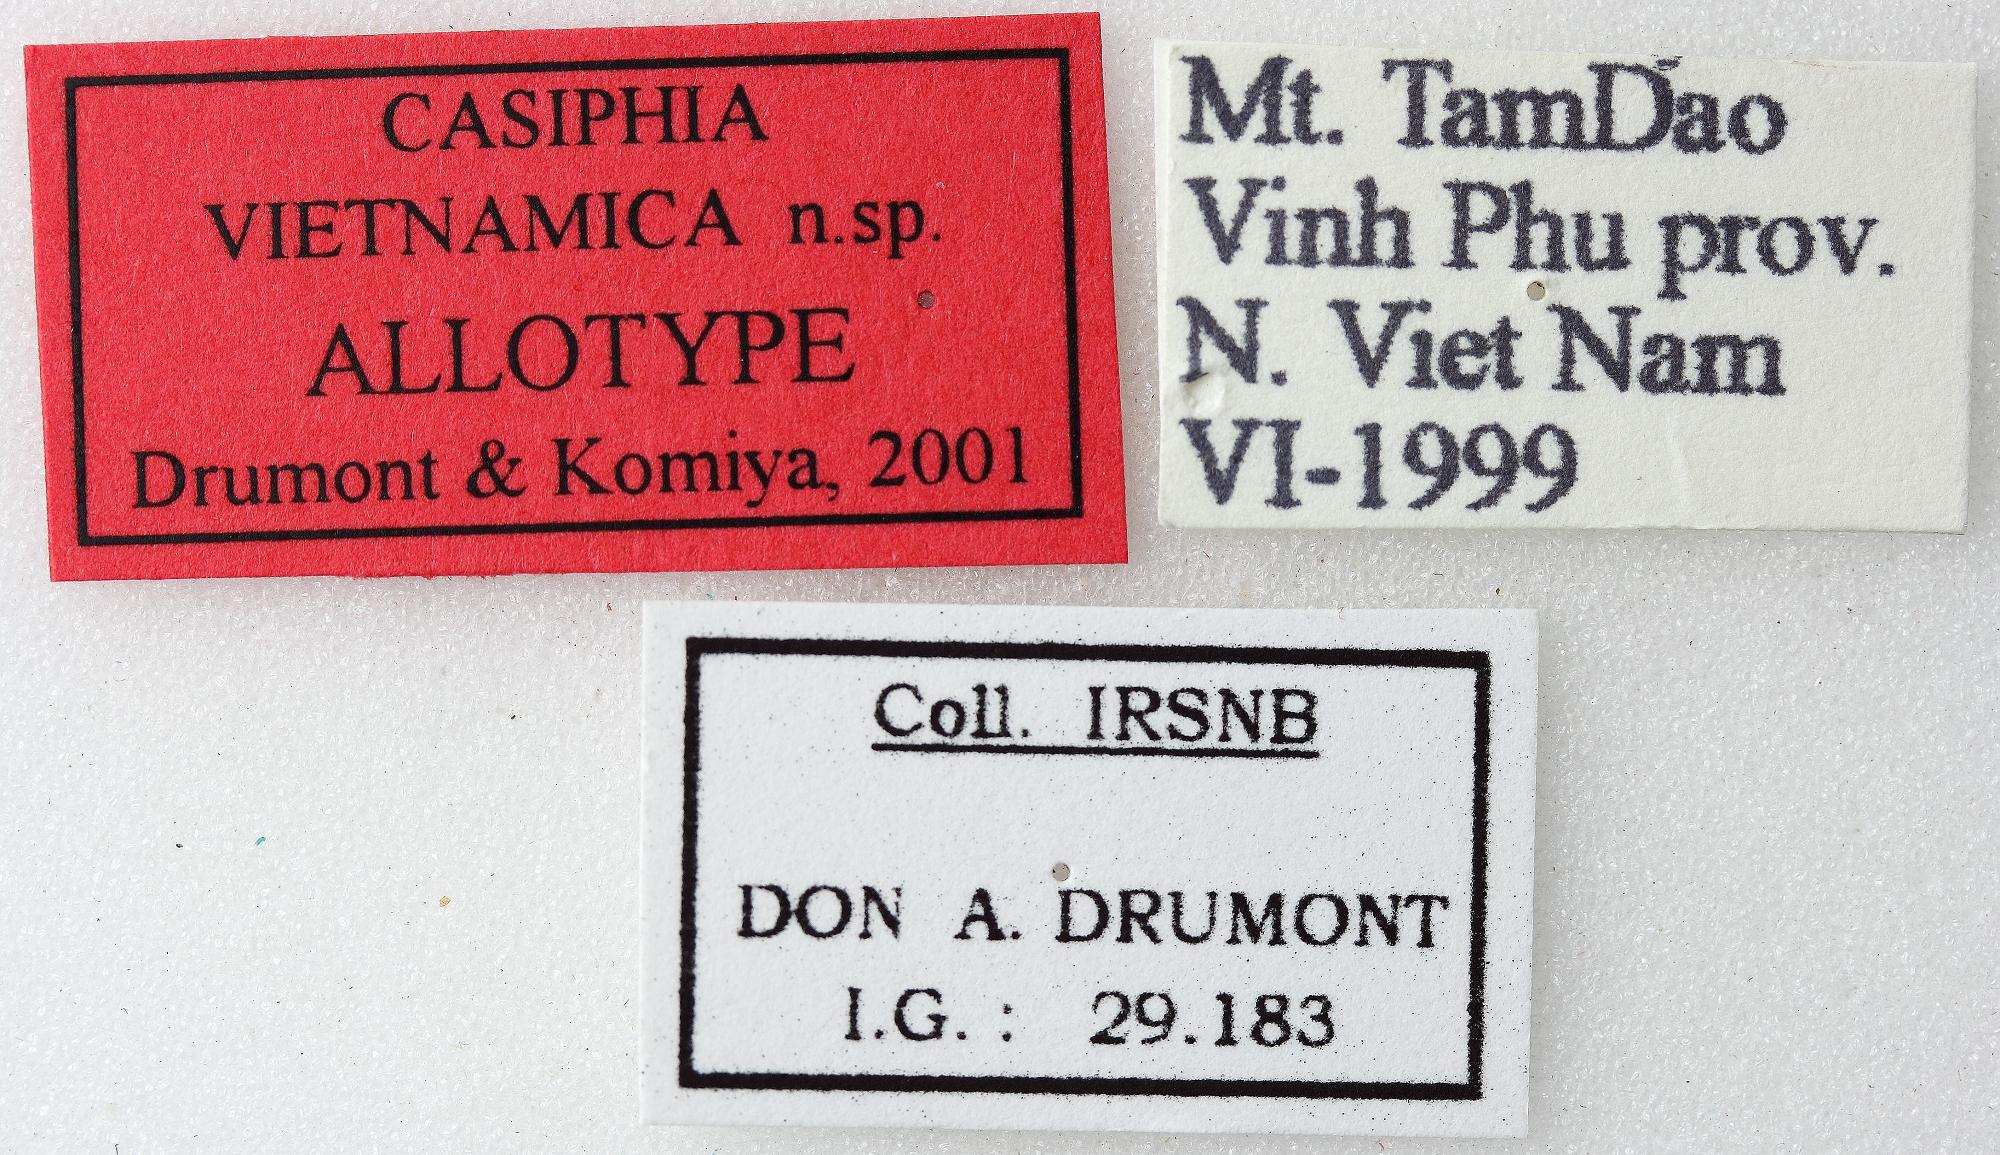 Casiphia vietnamica 02 00 Allotype M 018 BRUS 201405.jpg